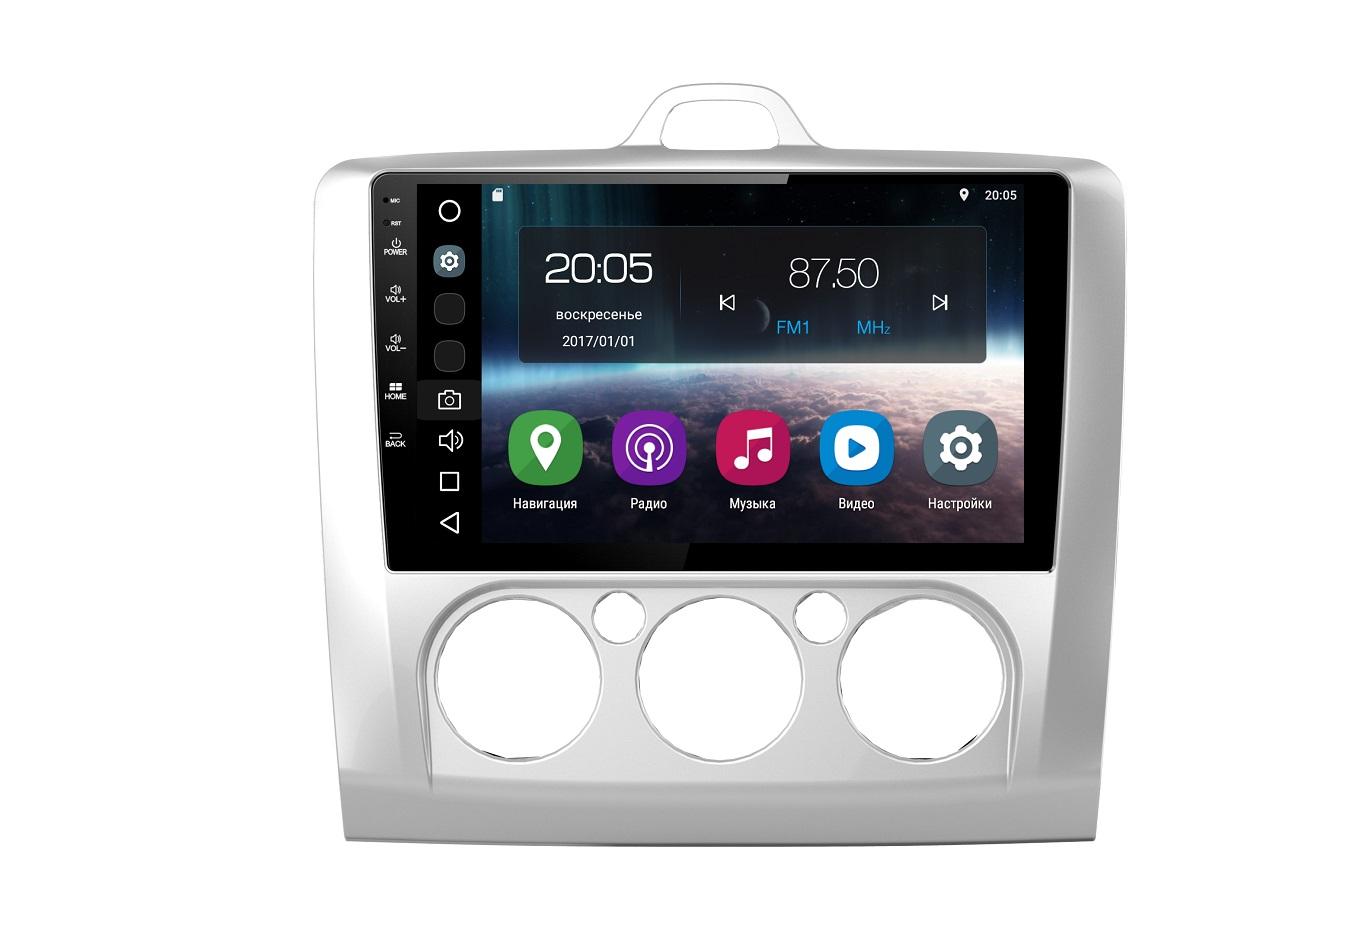 Штатная магнитола FarCar s200 для Ford Focus, Mondeo, C-Max, Galaxy на Android (V003R)